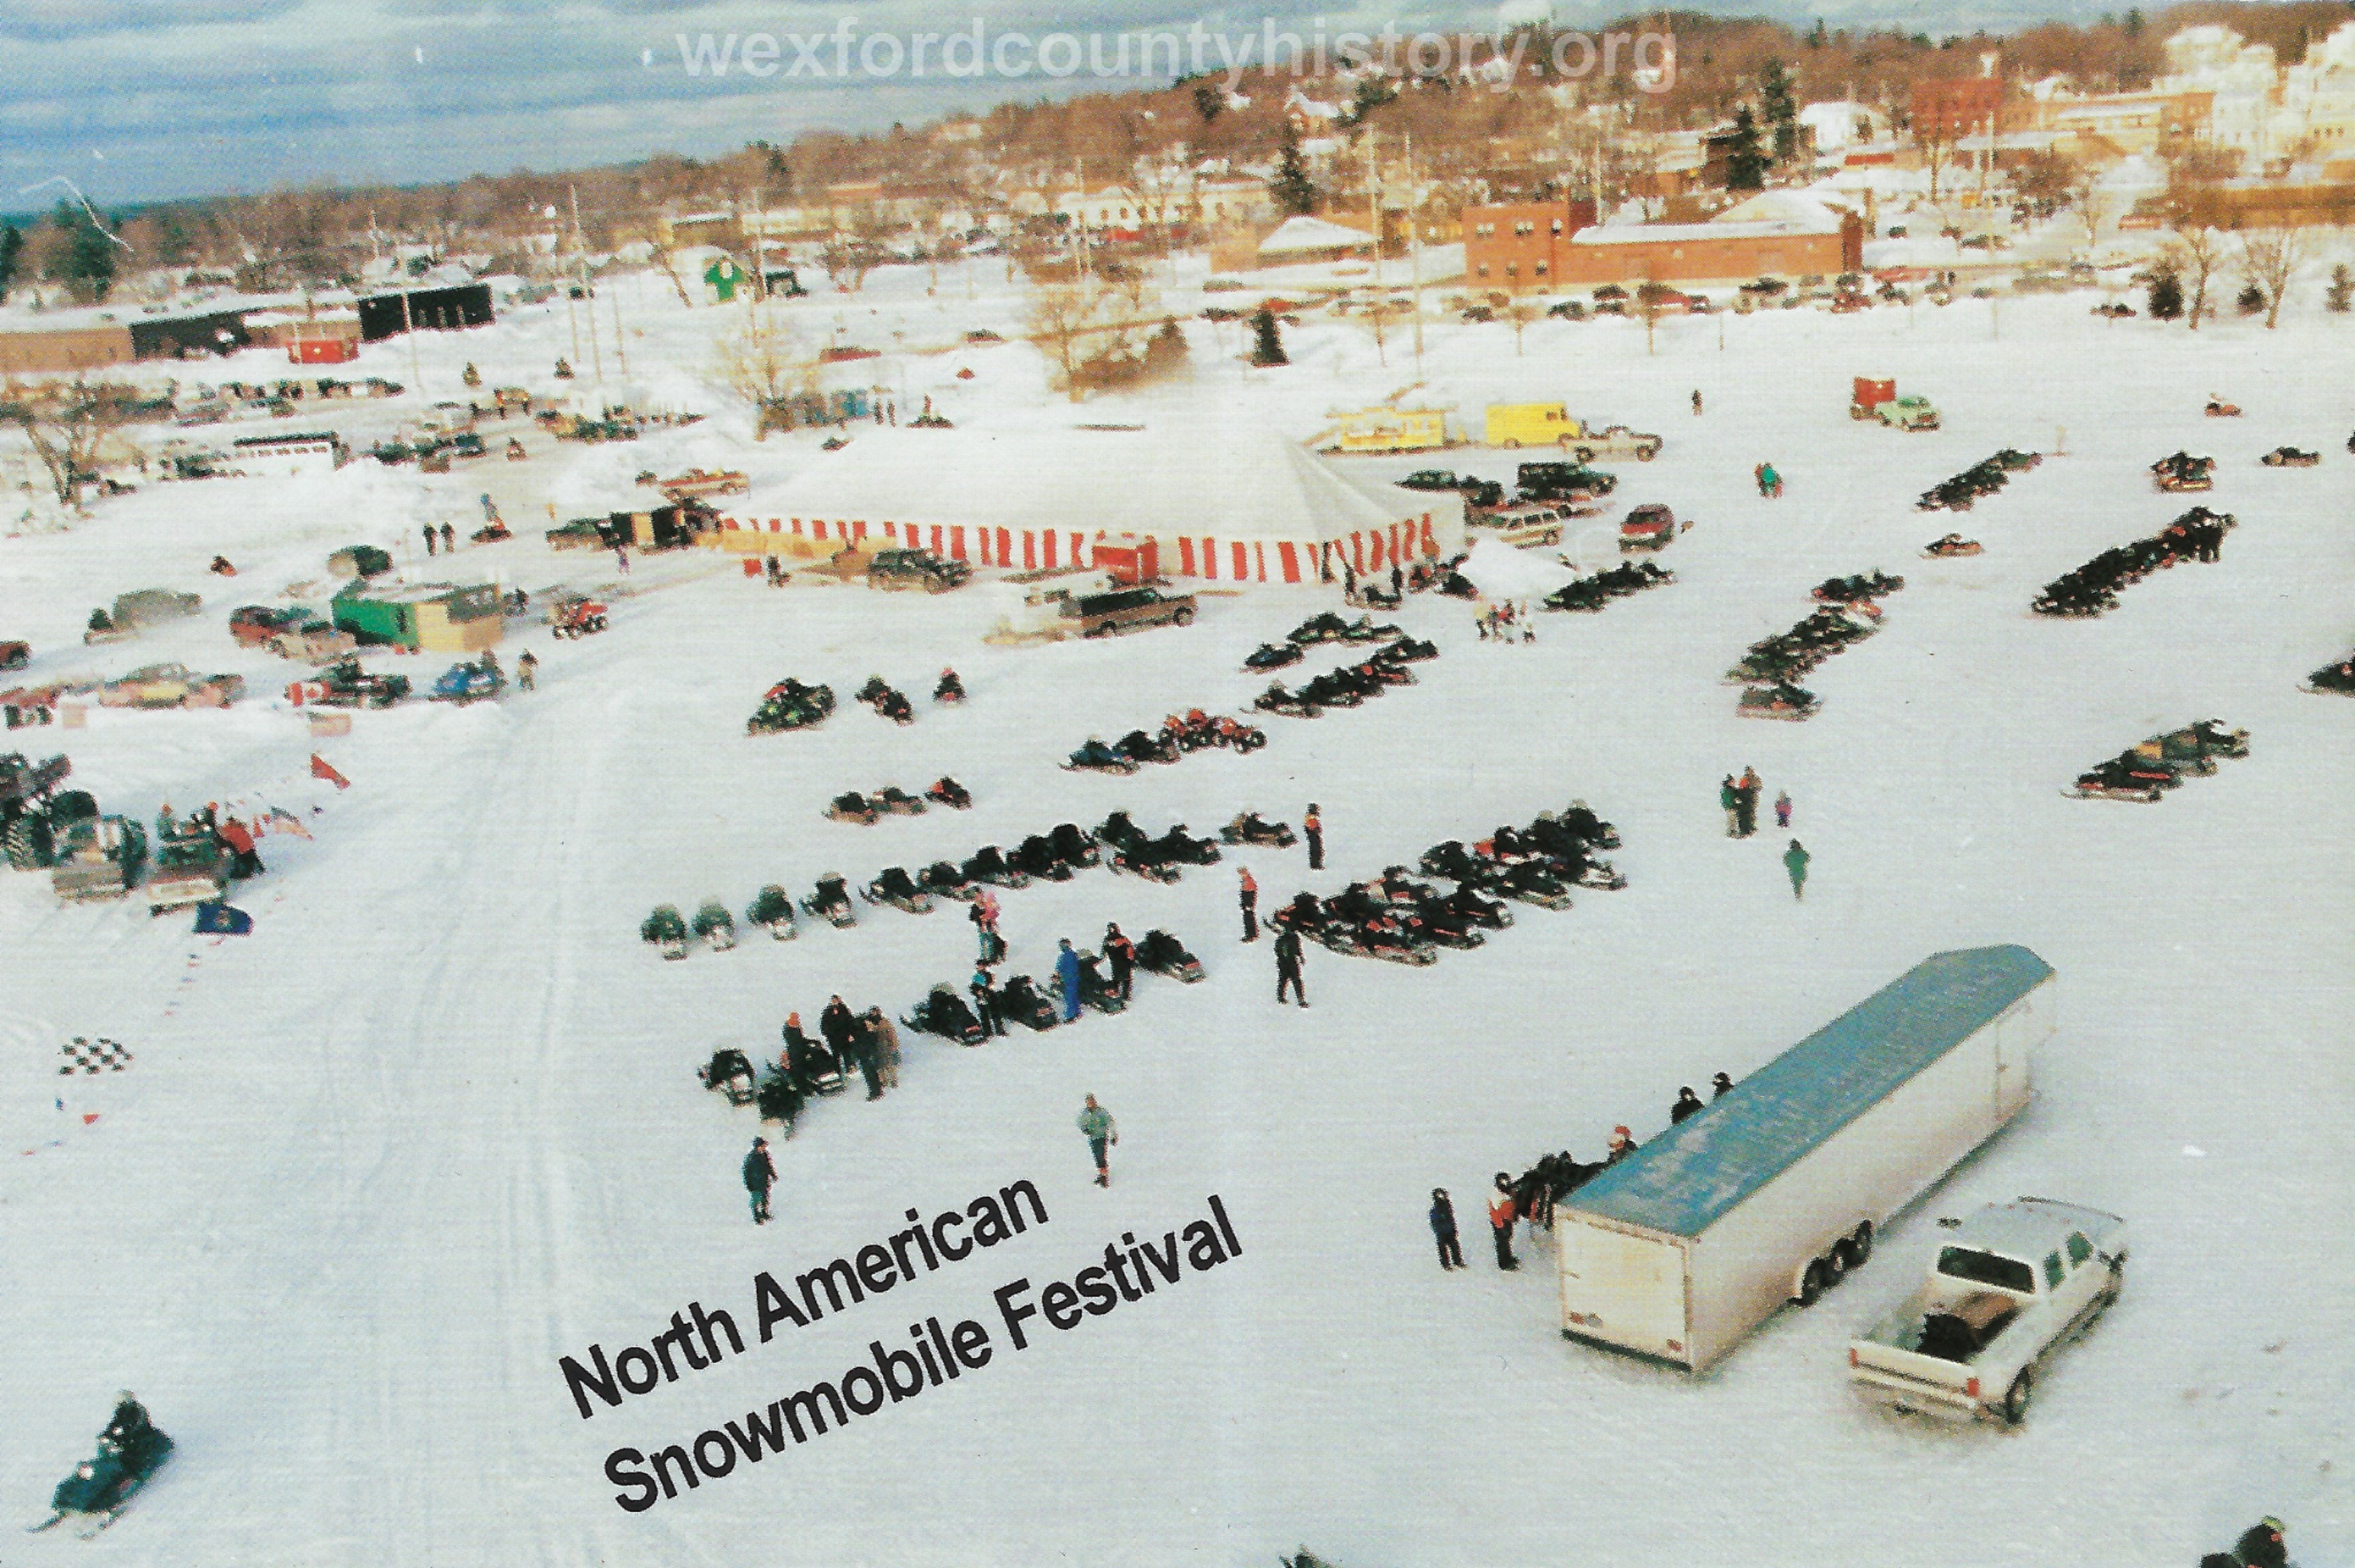 Cadillac-Recreation-North-American-Snowmobile-Festival